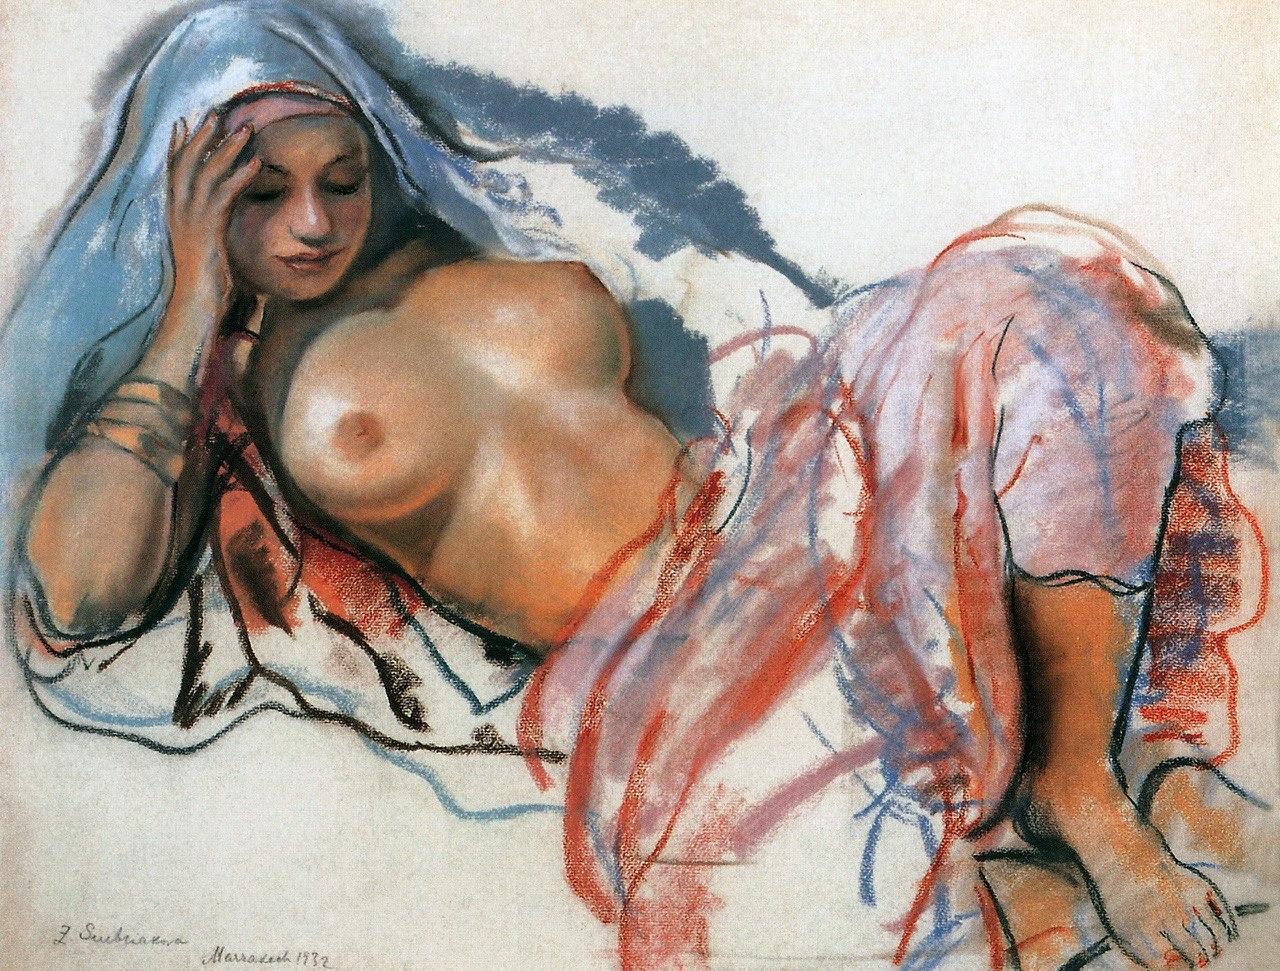 Серебрякова, мастер обнаженных женских натур   (1).jpg